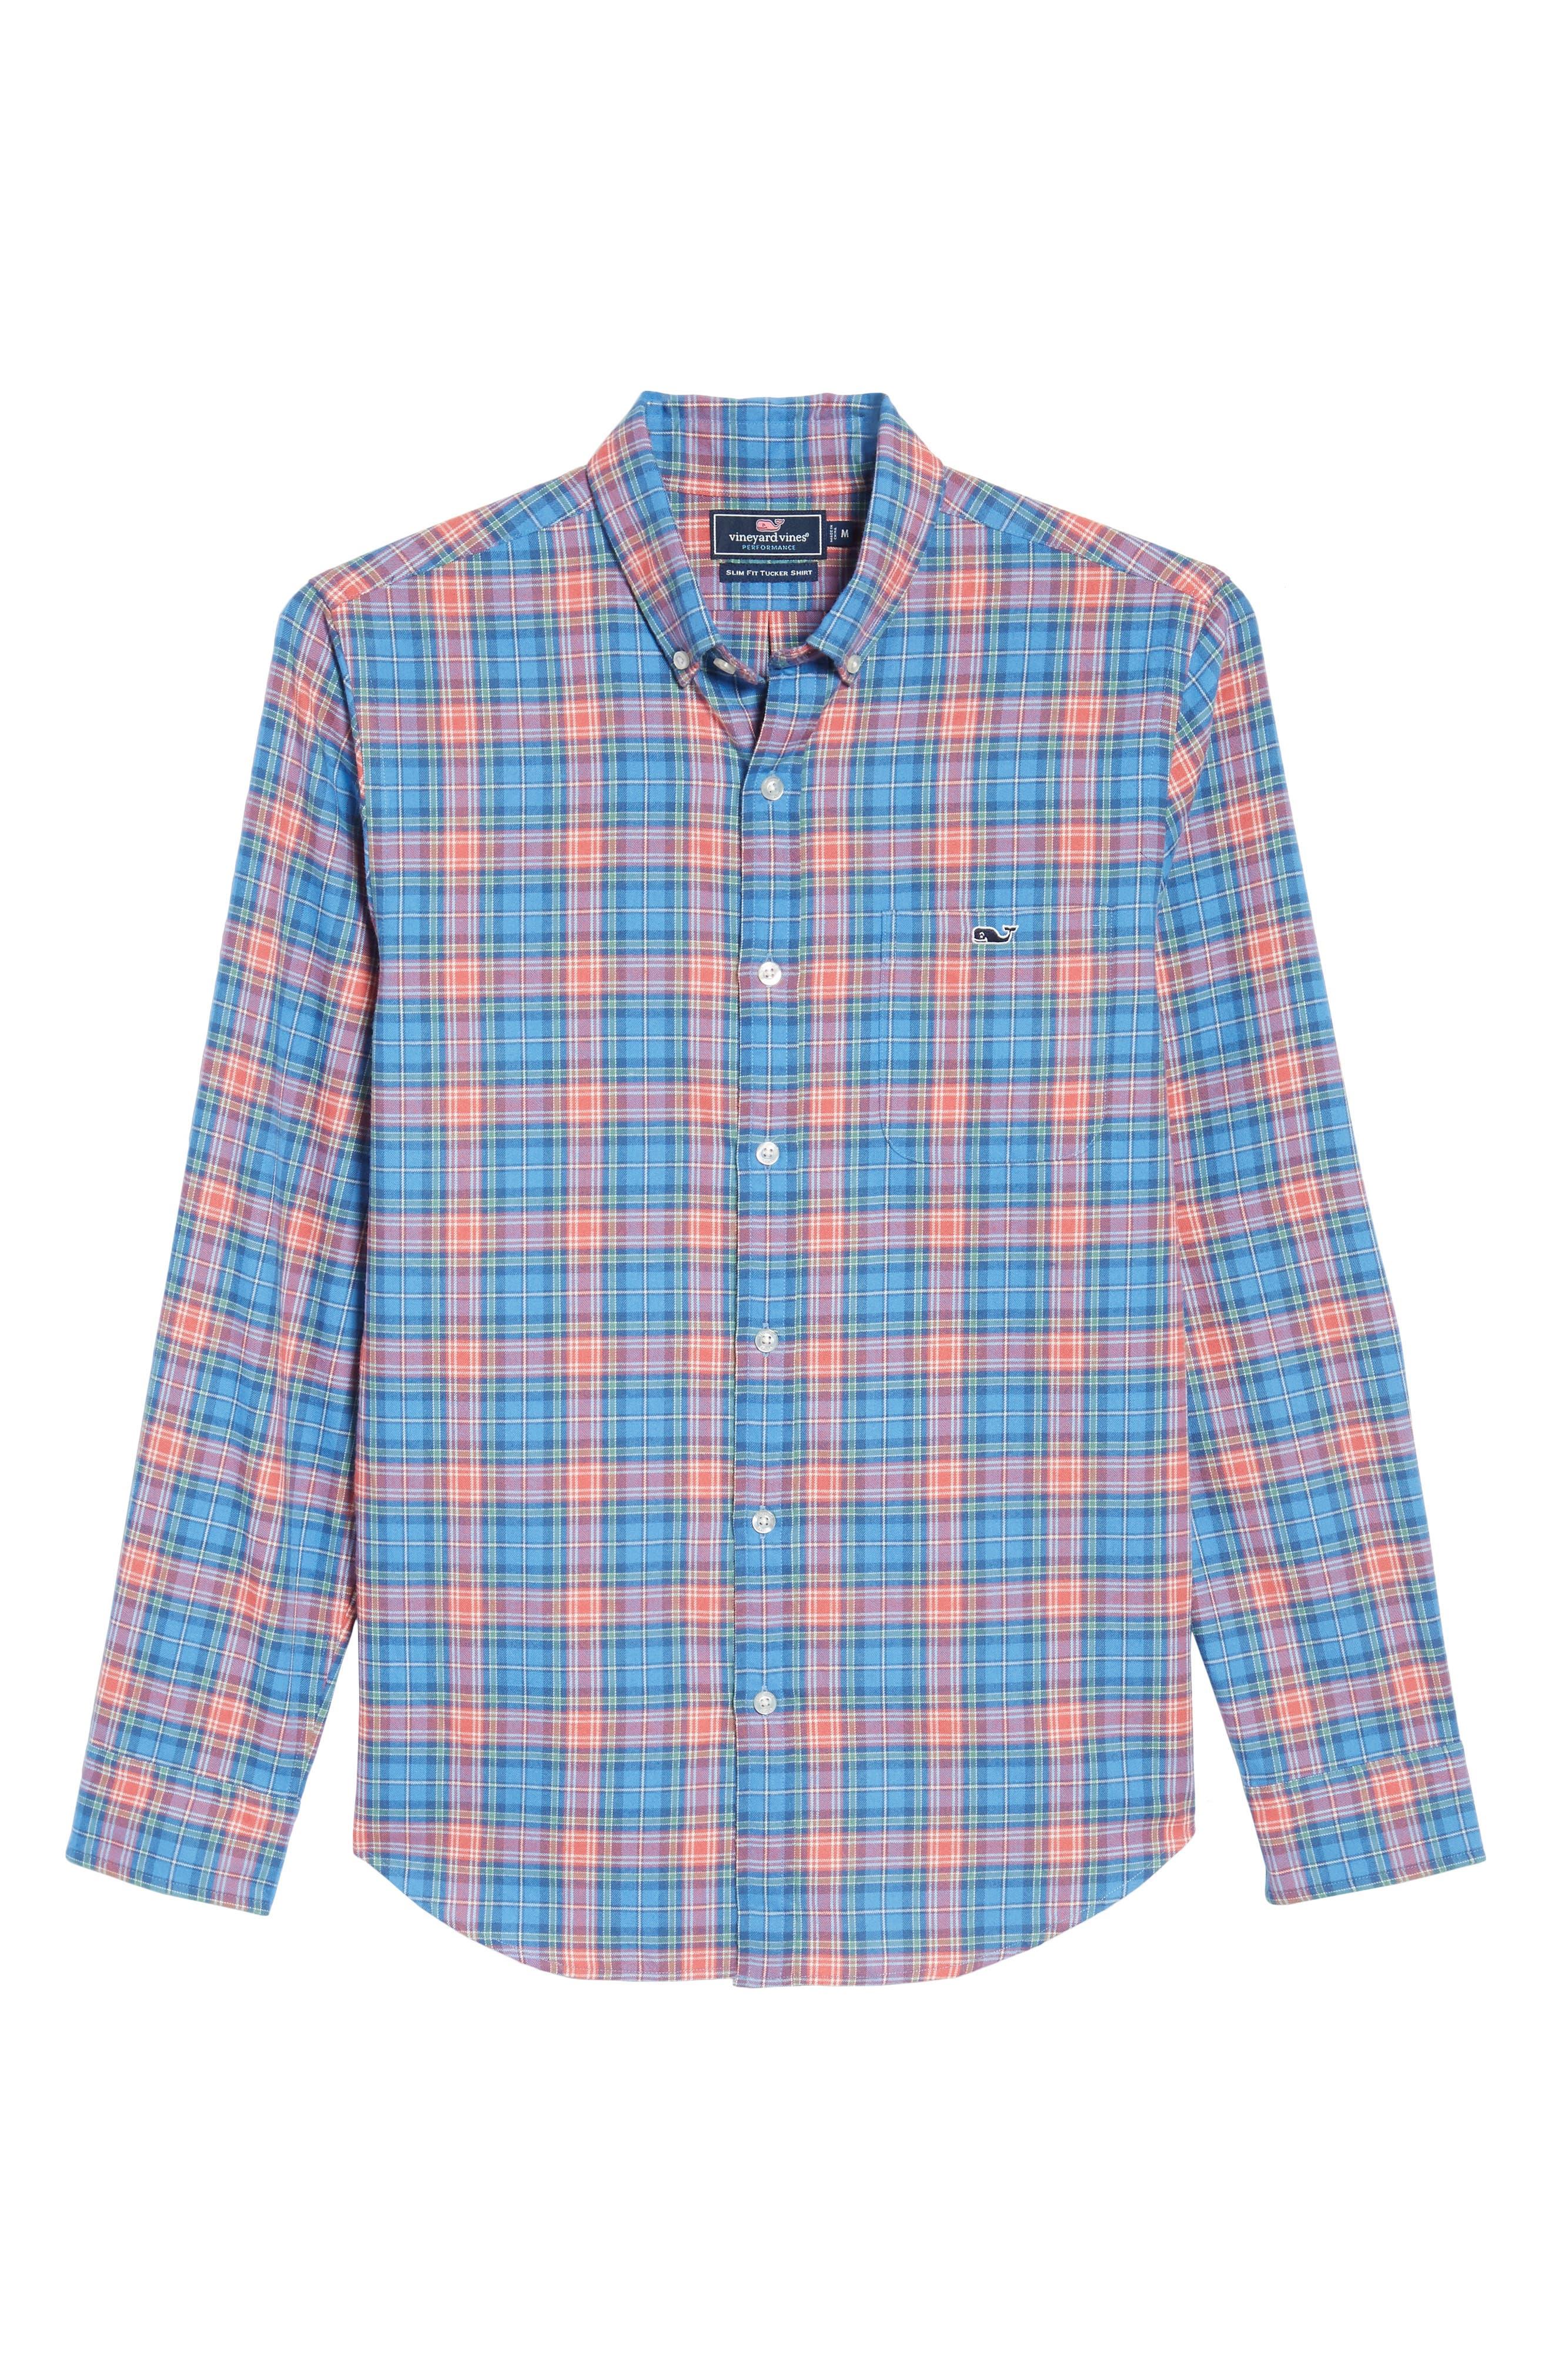 Kingsley Park Slim Fit Plaid Sport Shirt,                             Alternate thumbnail 6, color,                             431